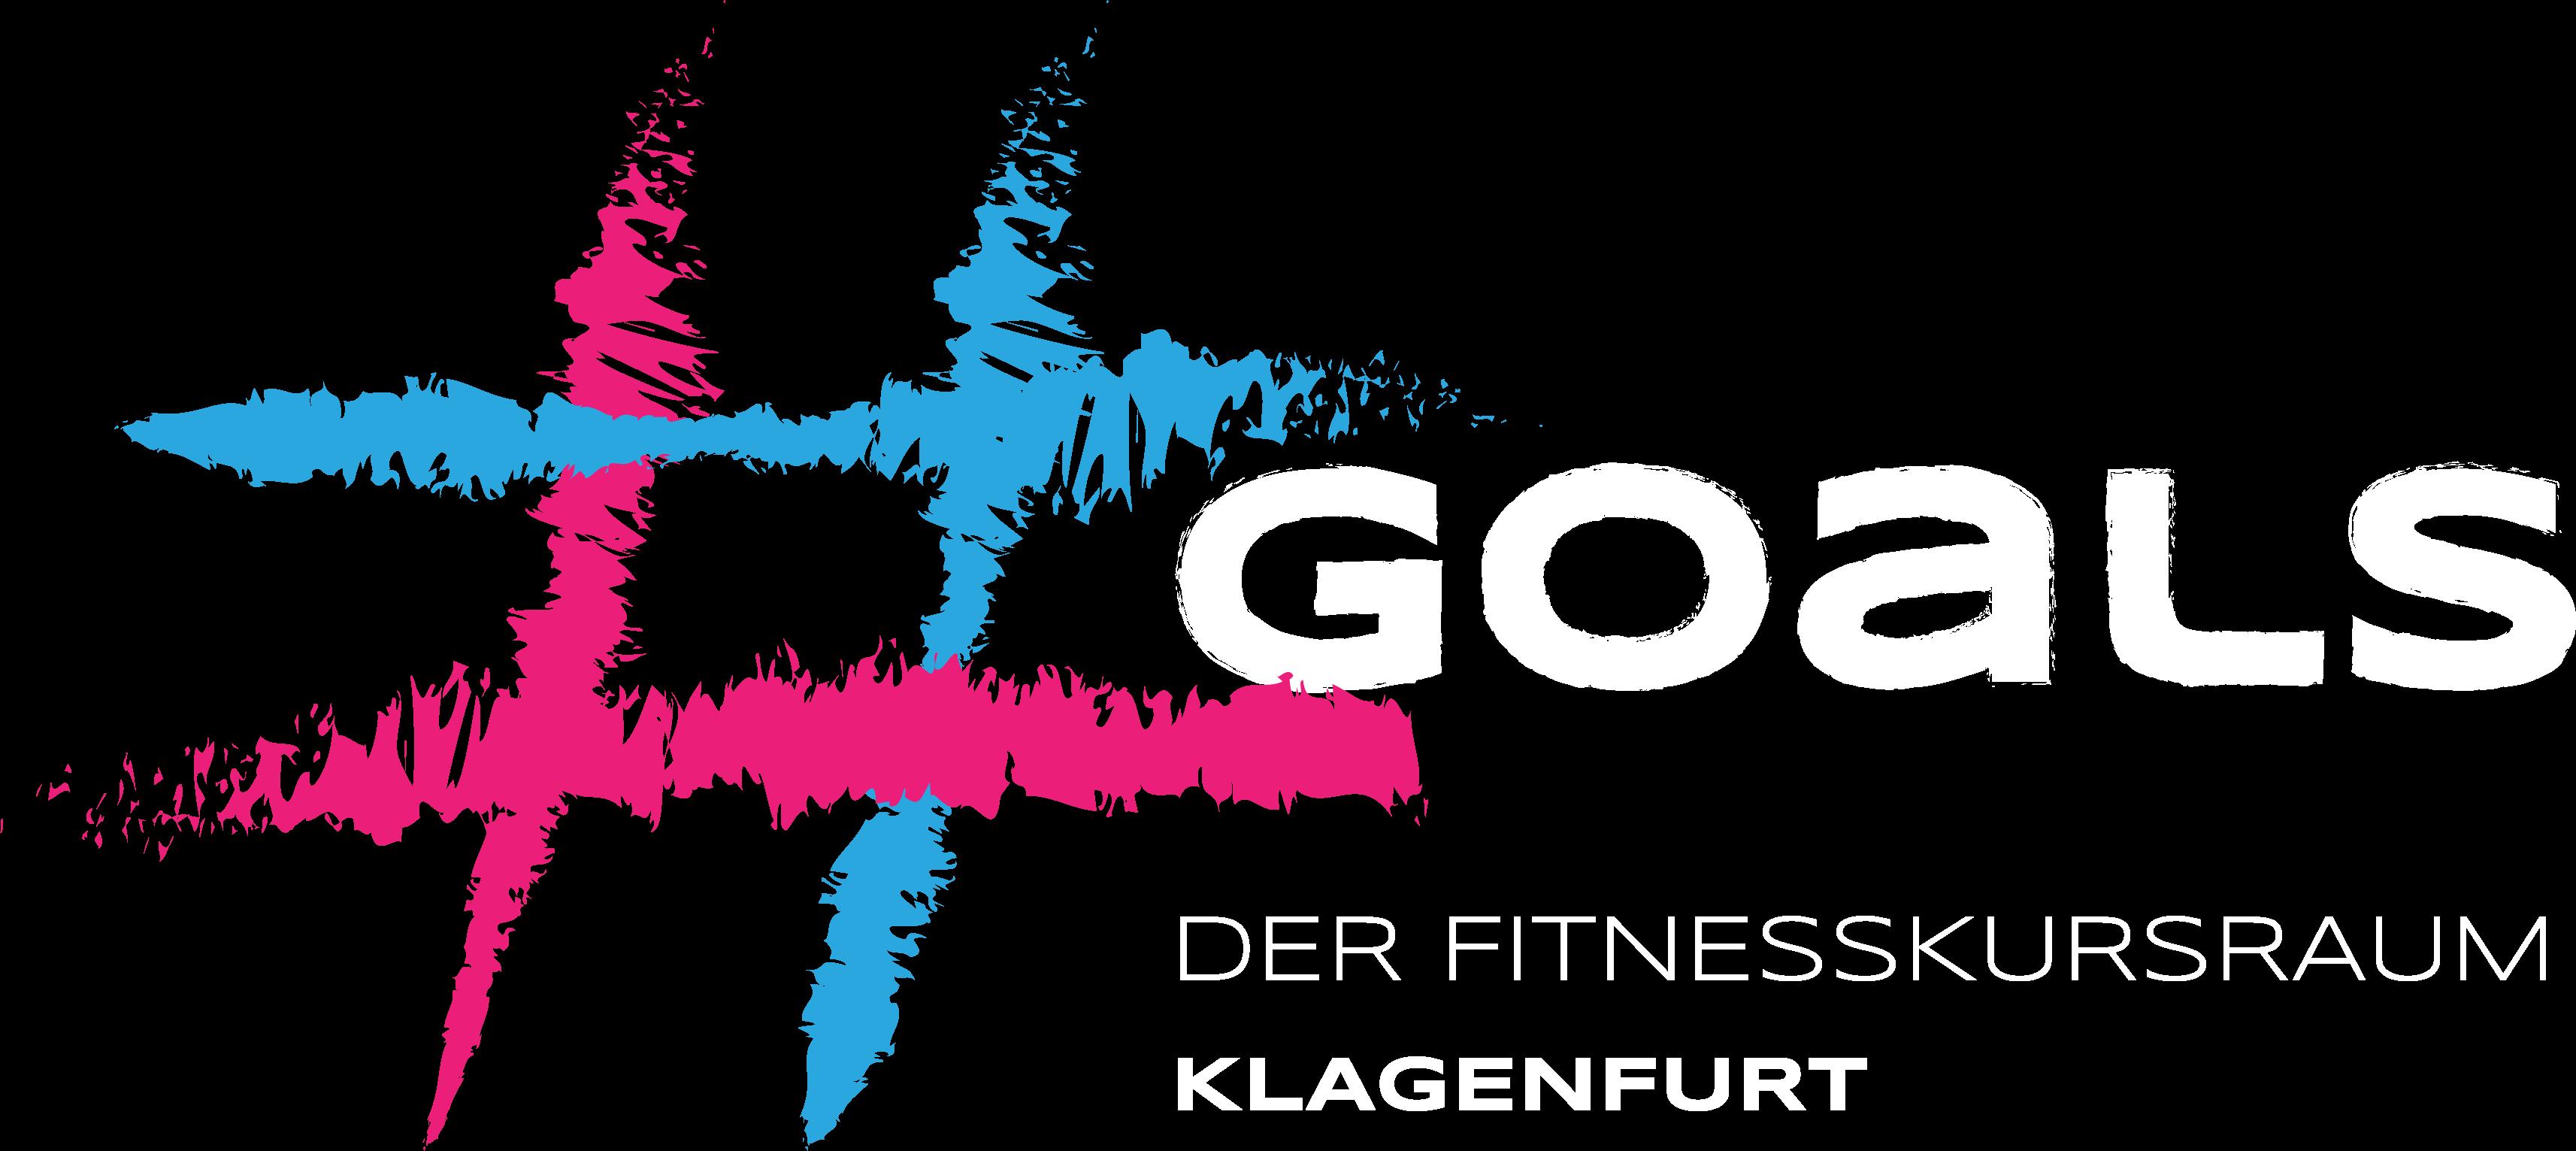 #GOALS